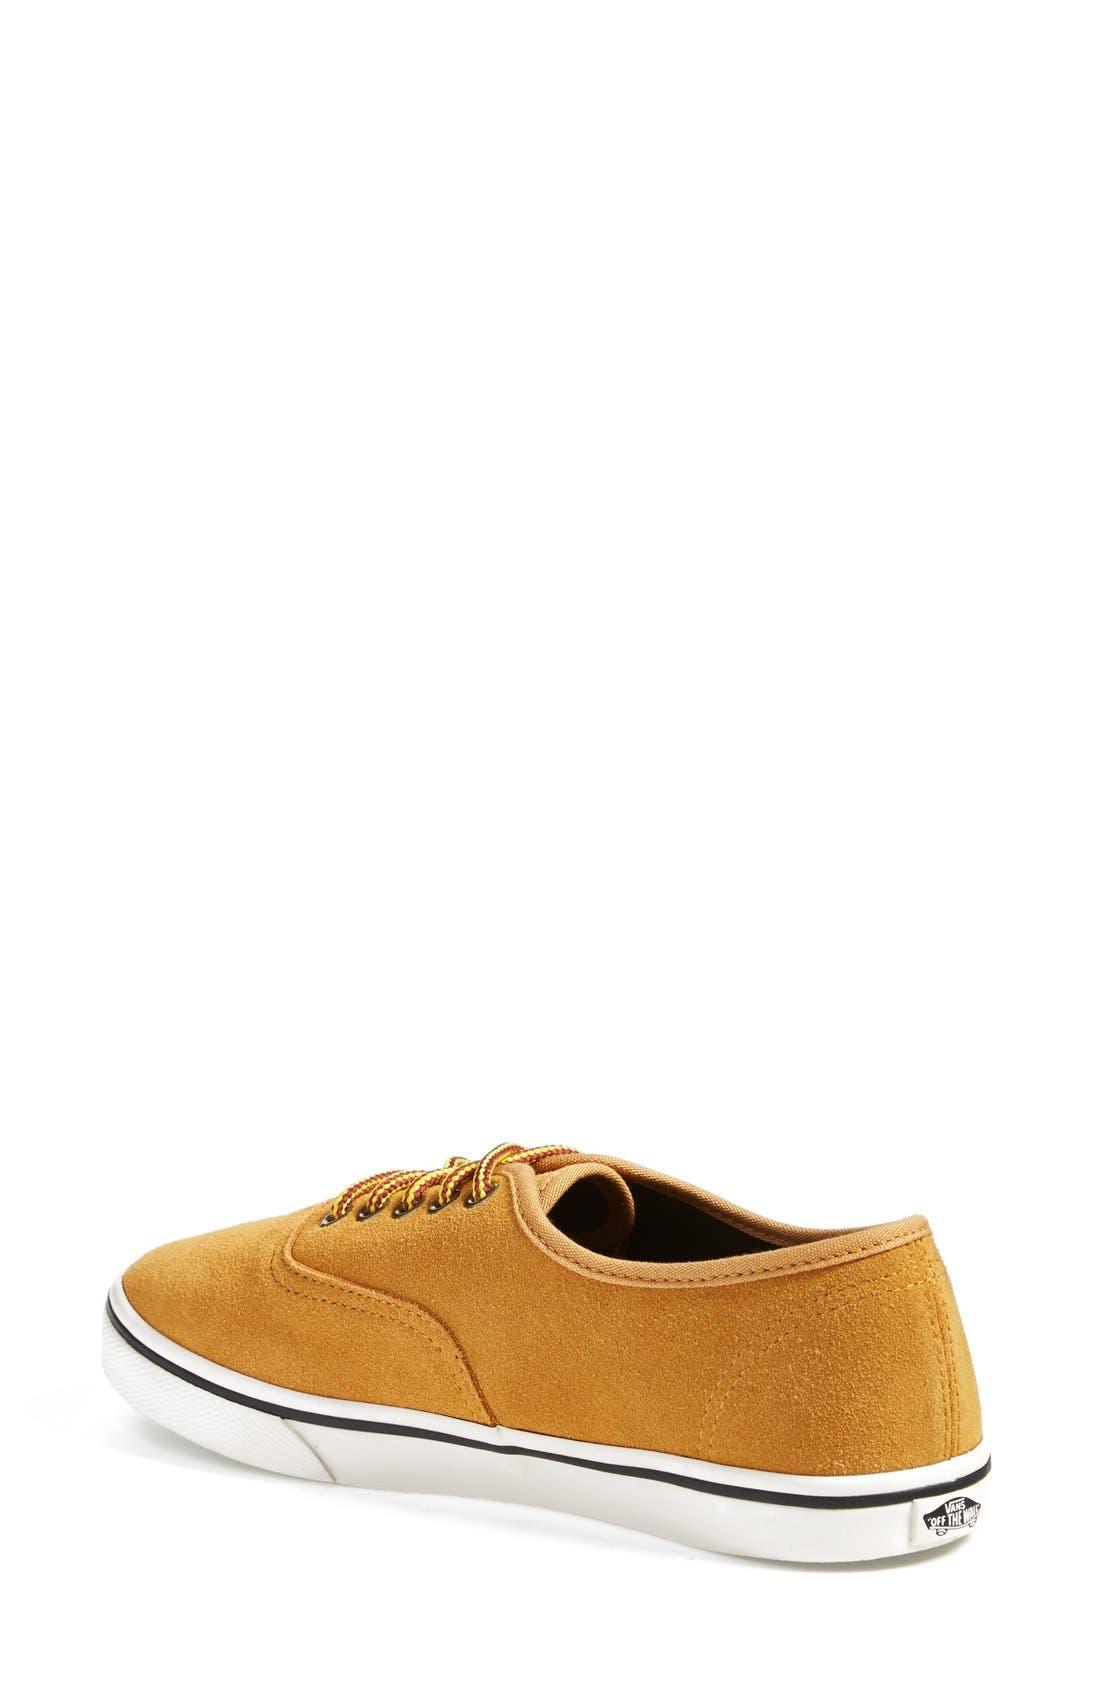 Alternate Image 2  - Vans 'Authentic - Lo Pro' Suede Sneaker (Women)